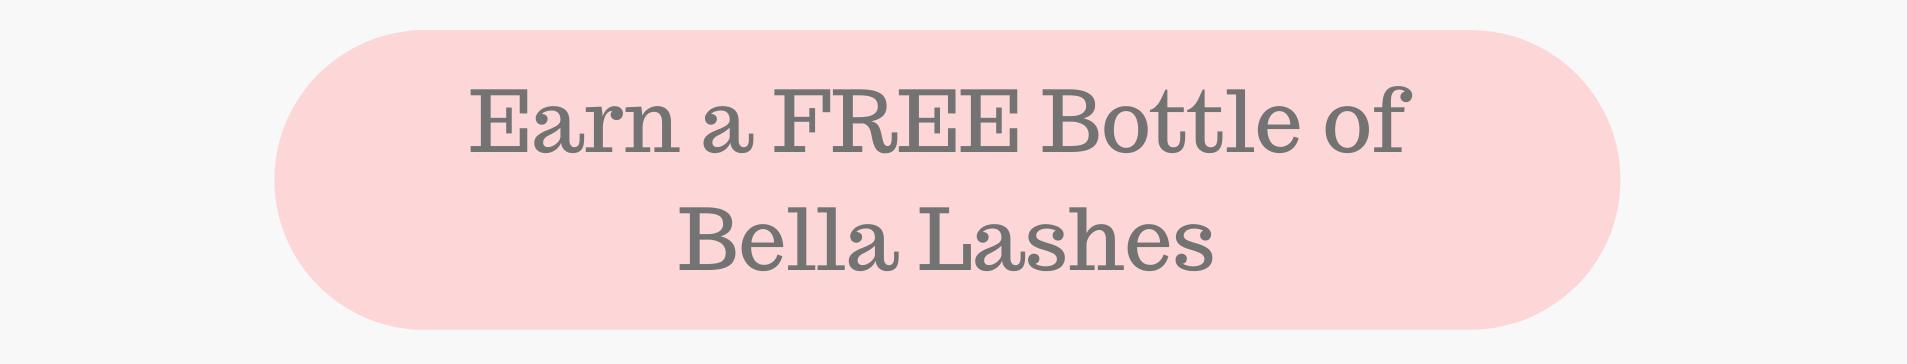 Earn a Free bottle of Bella Lashes